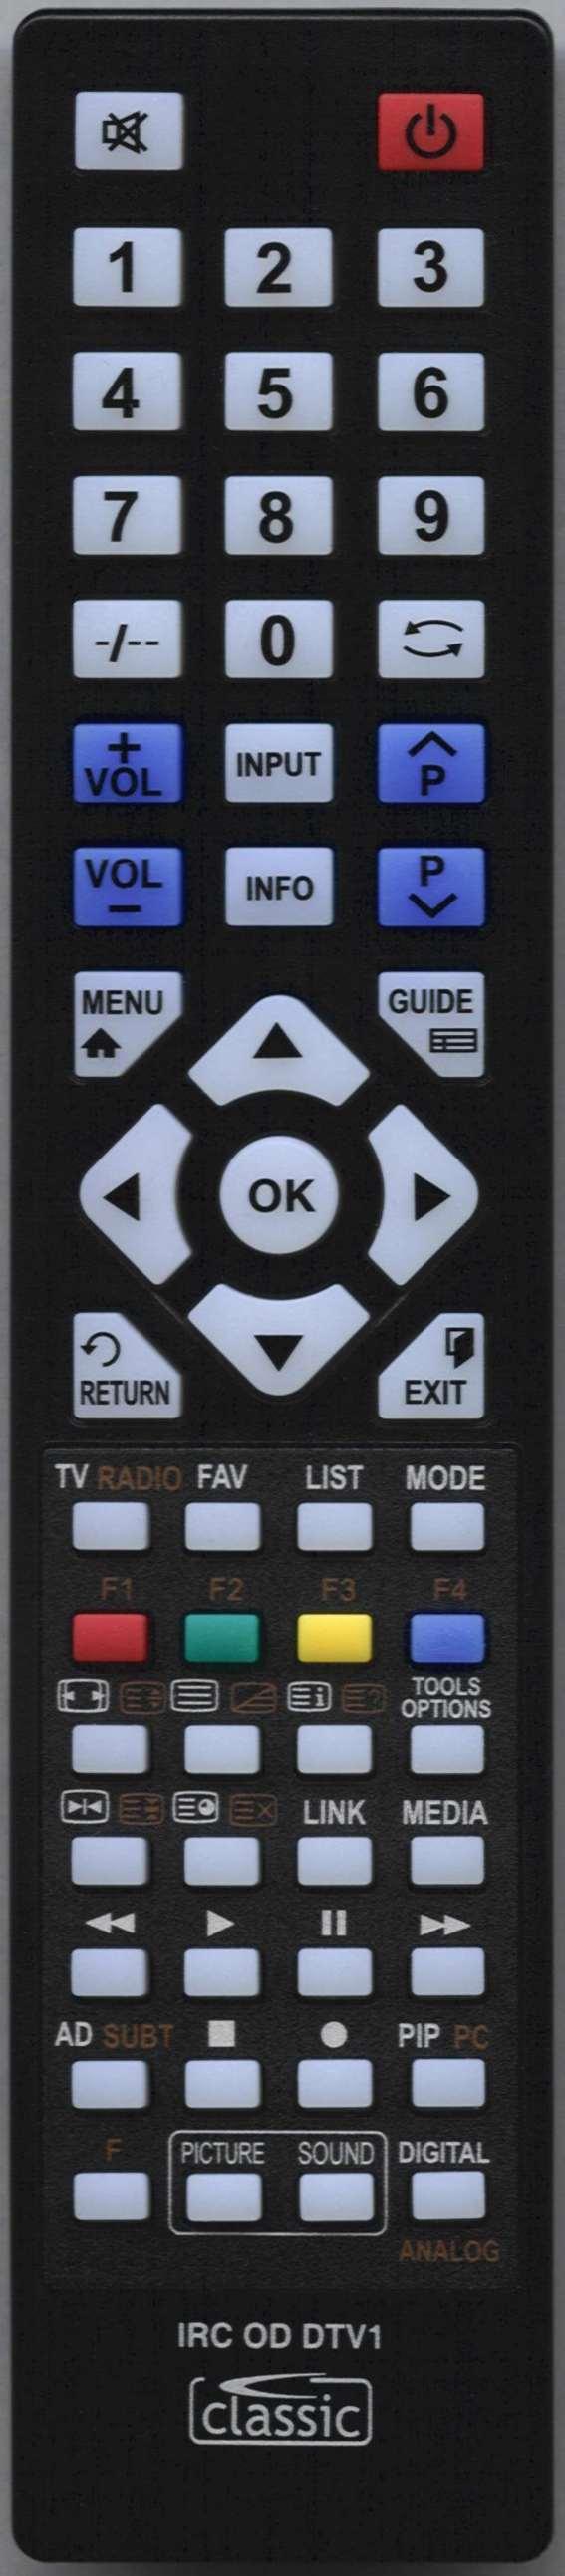 Wharfedale LT19T1CBW Remote Control Alternative